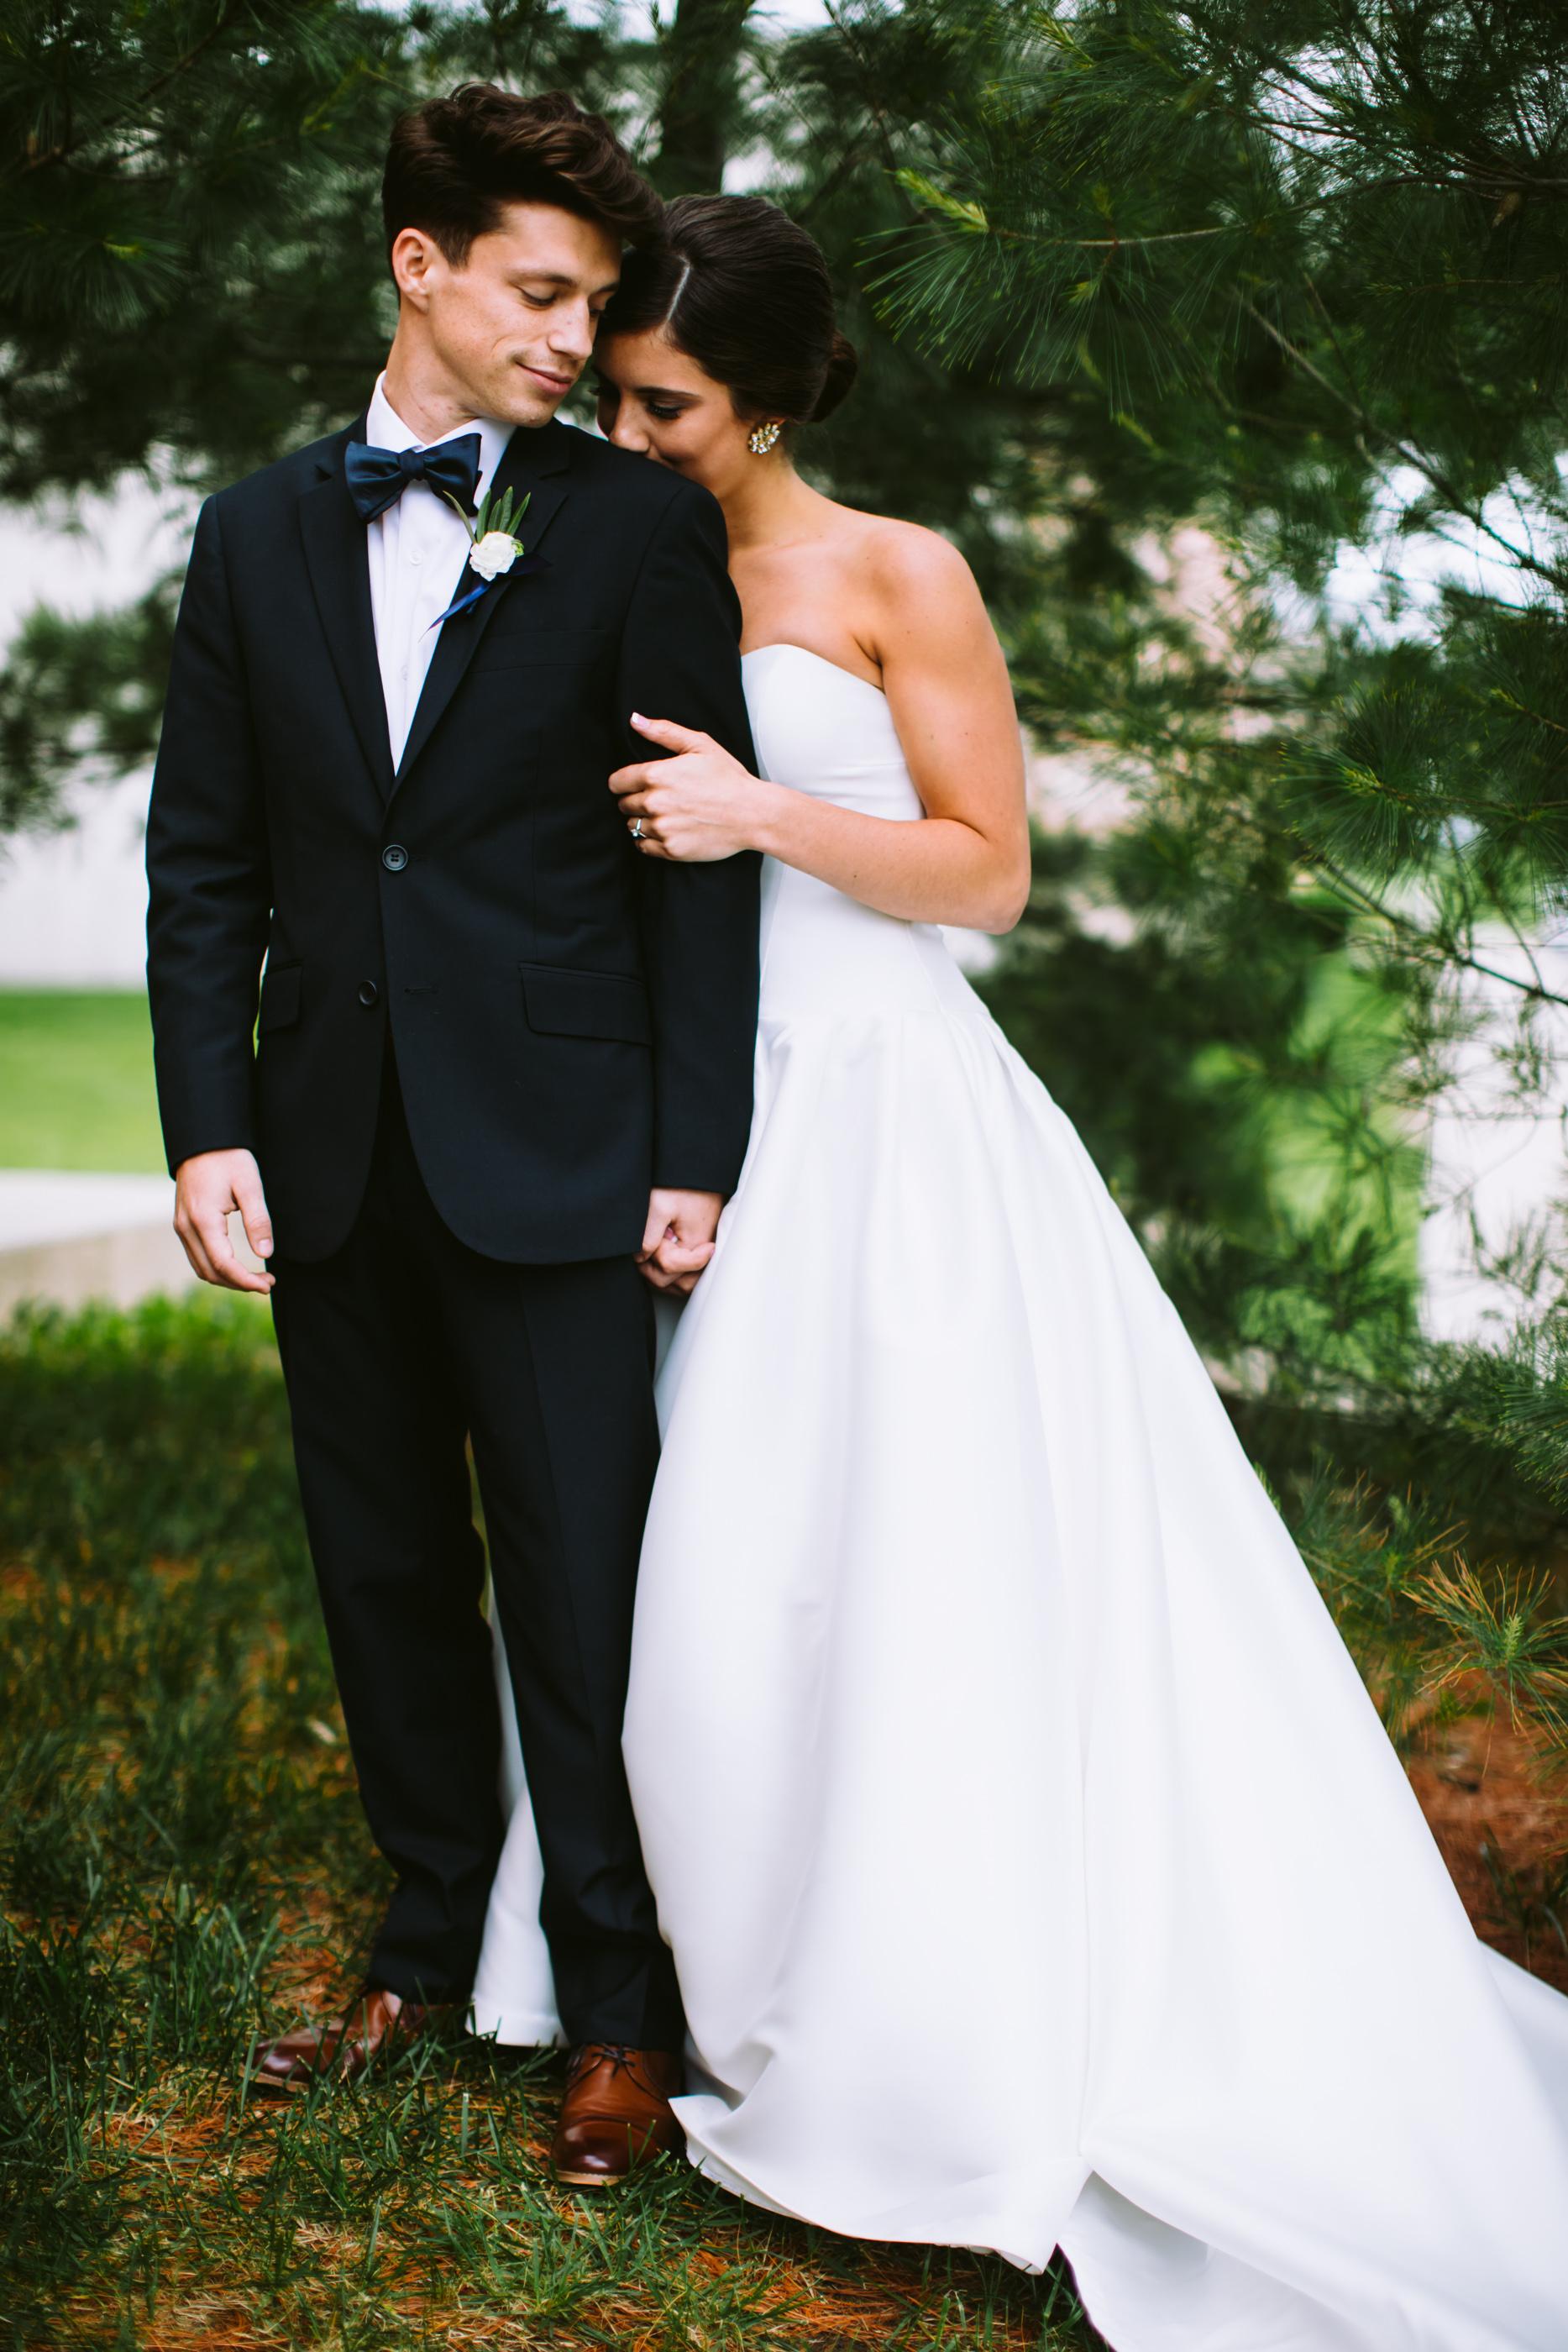 Brass on Baltimore_Kindling Wedding Photography_6.JPG